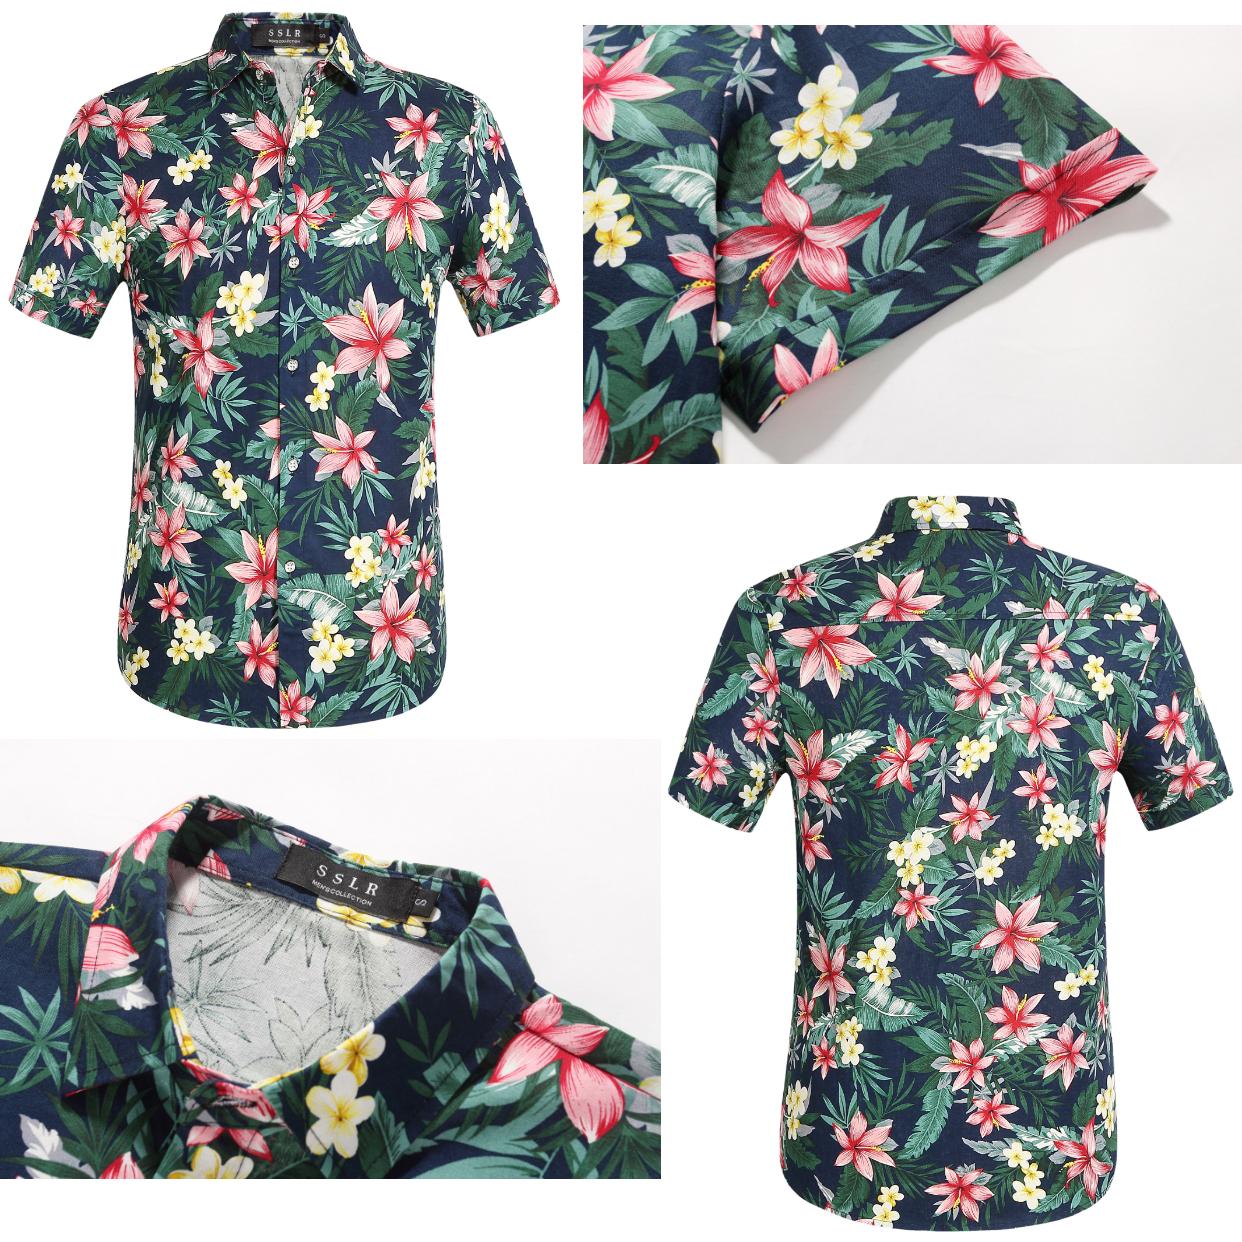 Tropical Floral Hawaiian Shirt Beach Party Hawaiian Shirt Tropical Party Aloha Party Personalized T Shirts Hawaiian Shirt Shirts